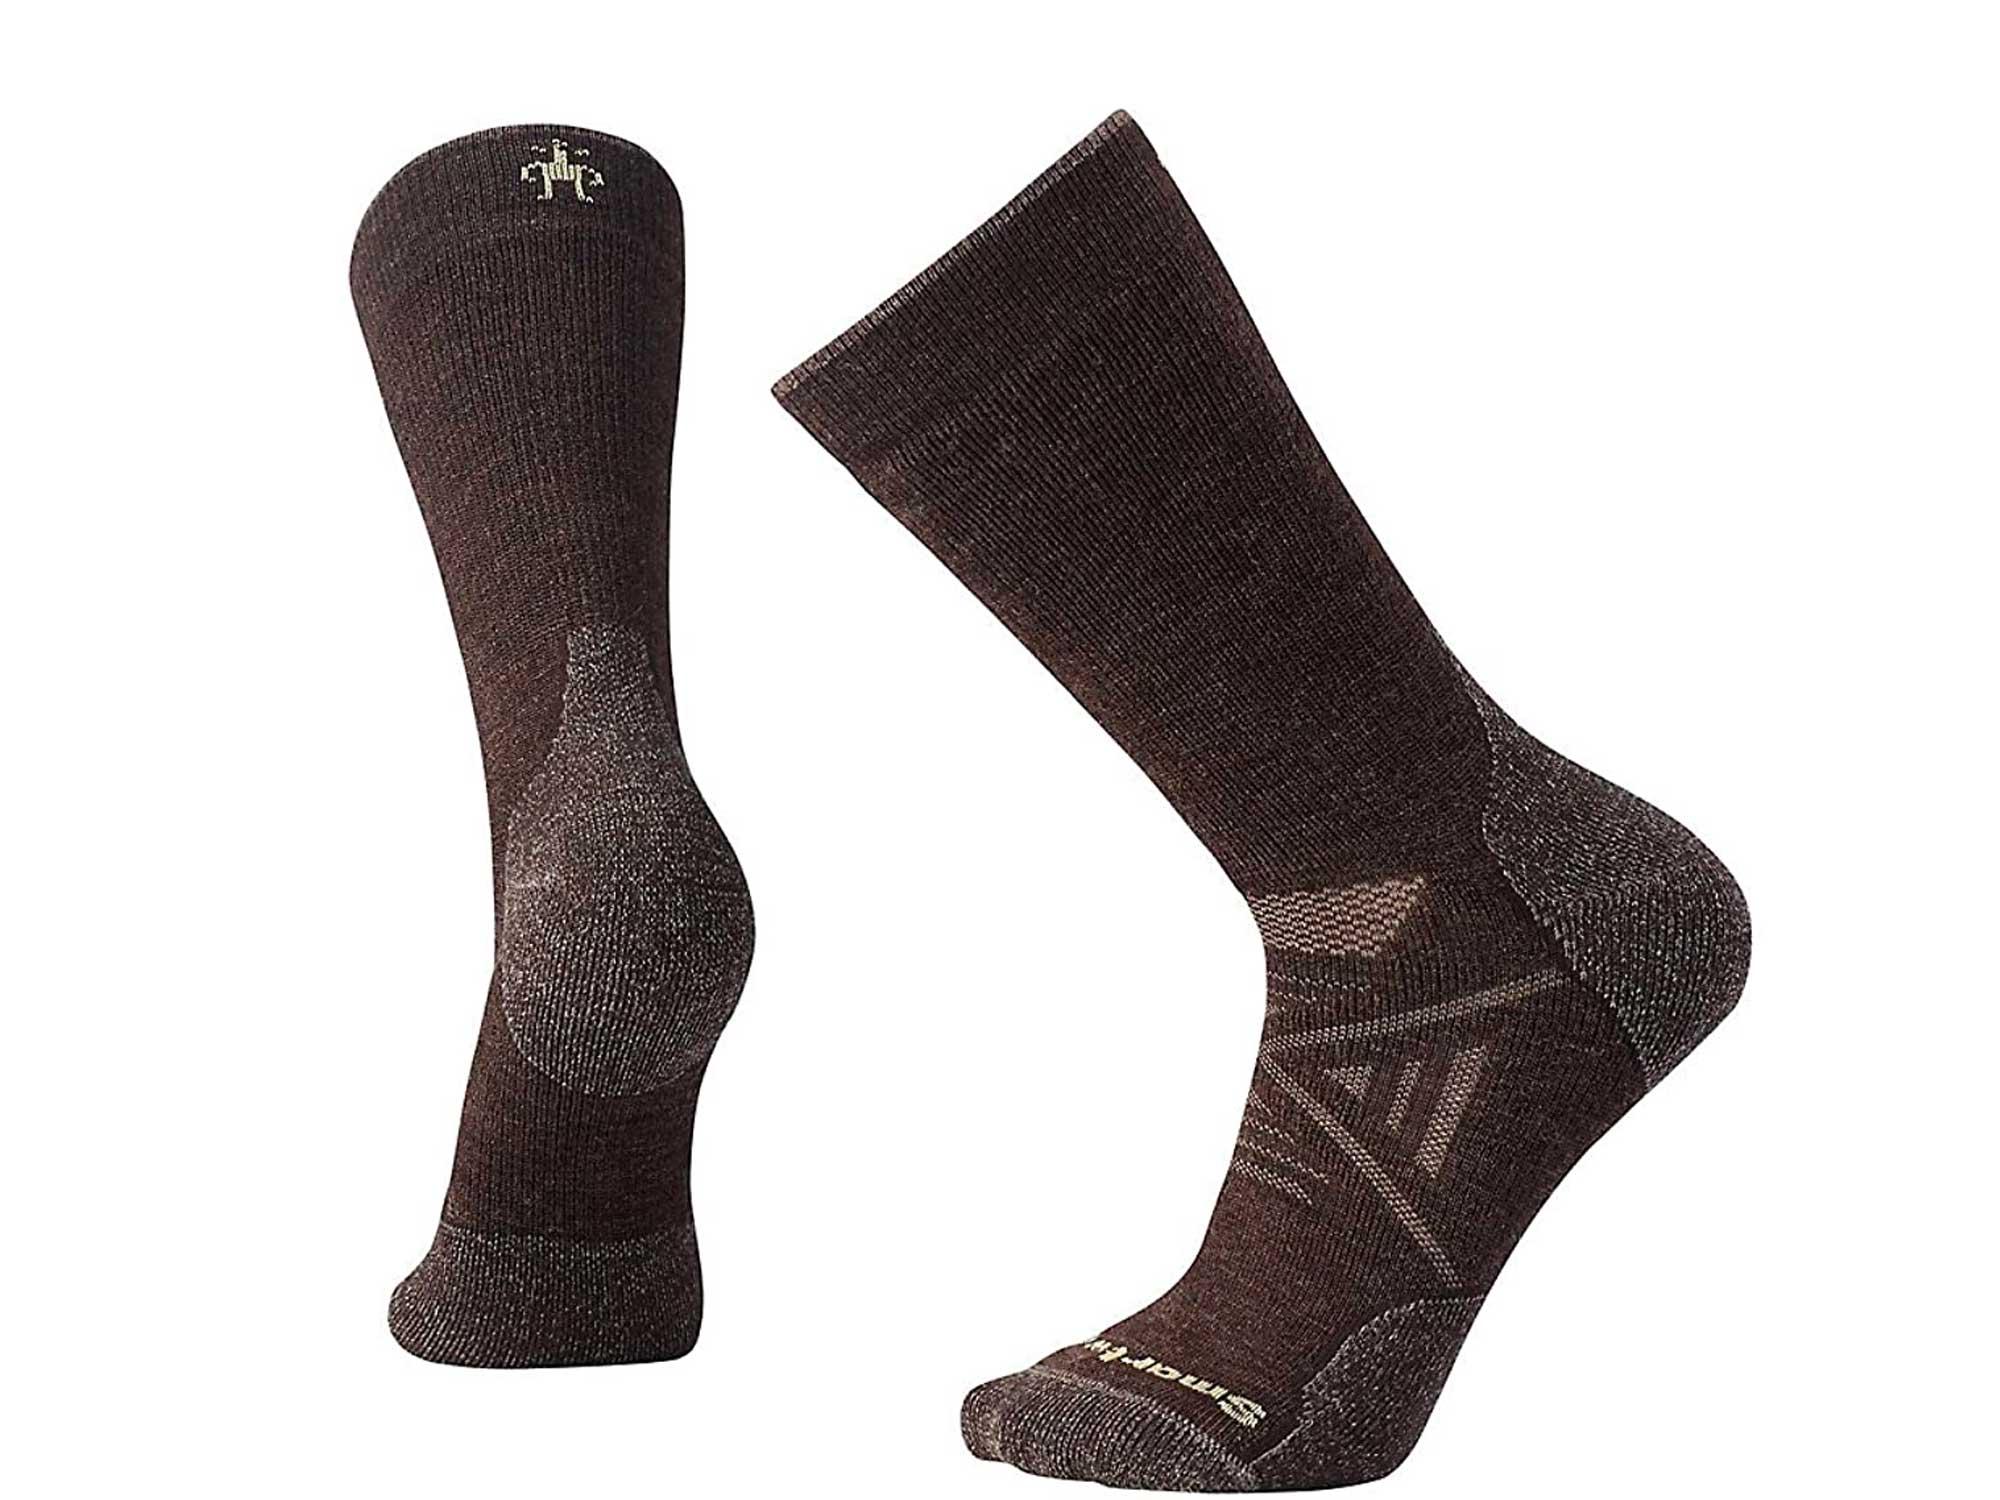 Smartwool mens socks are the best warm socks for hiking